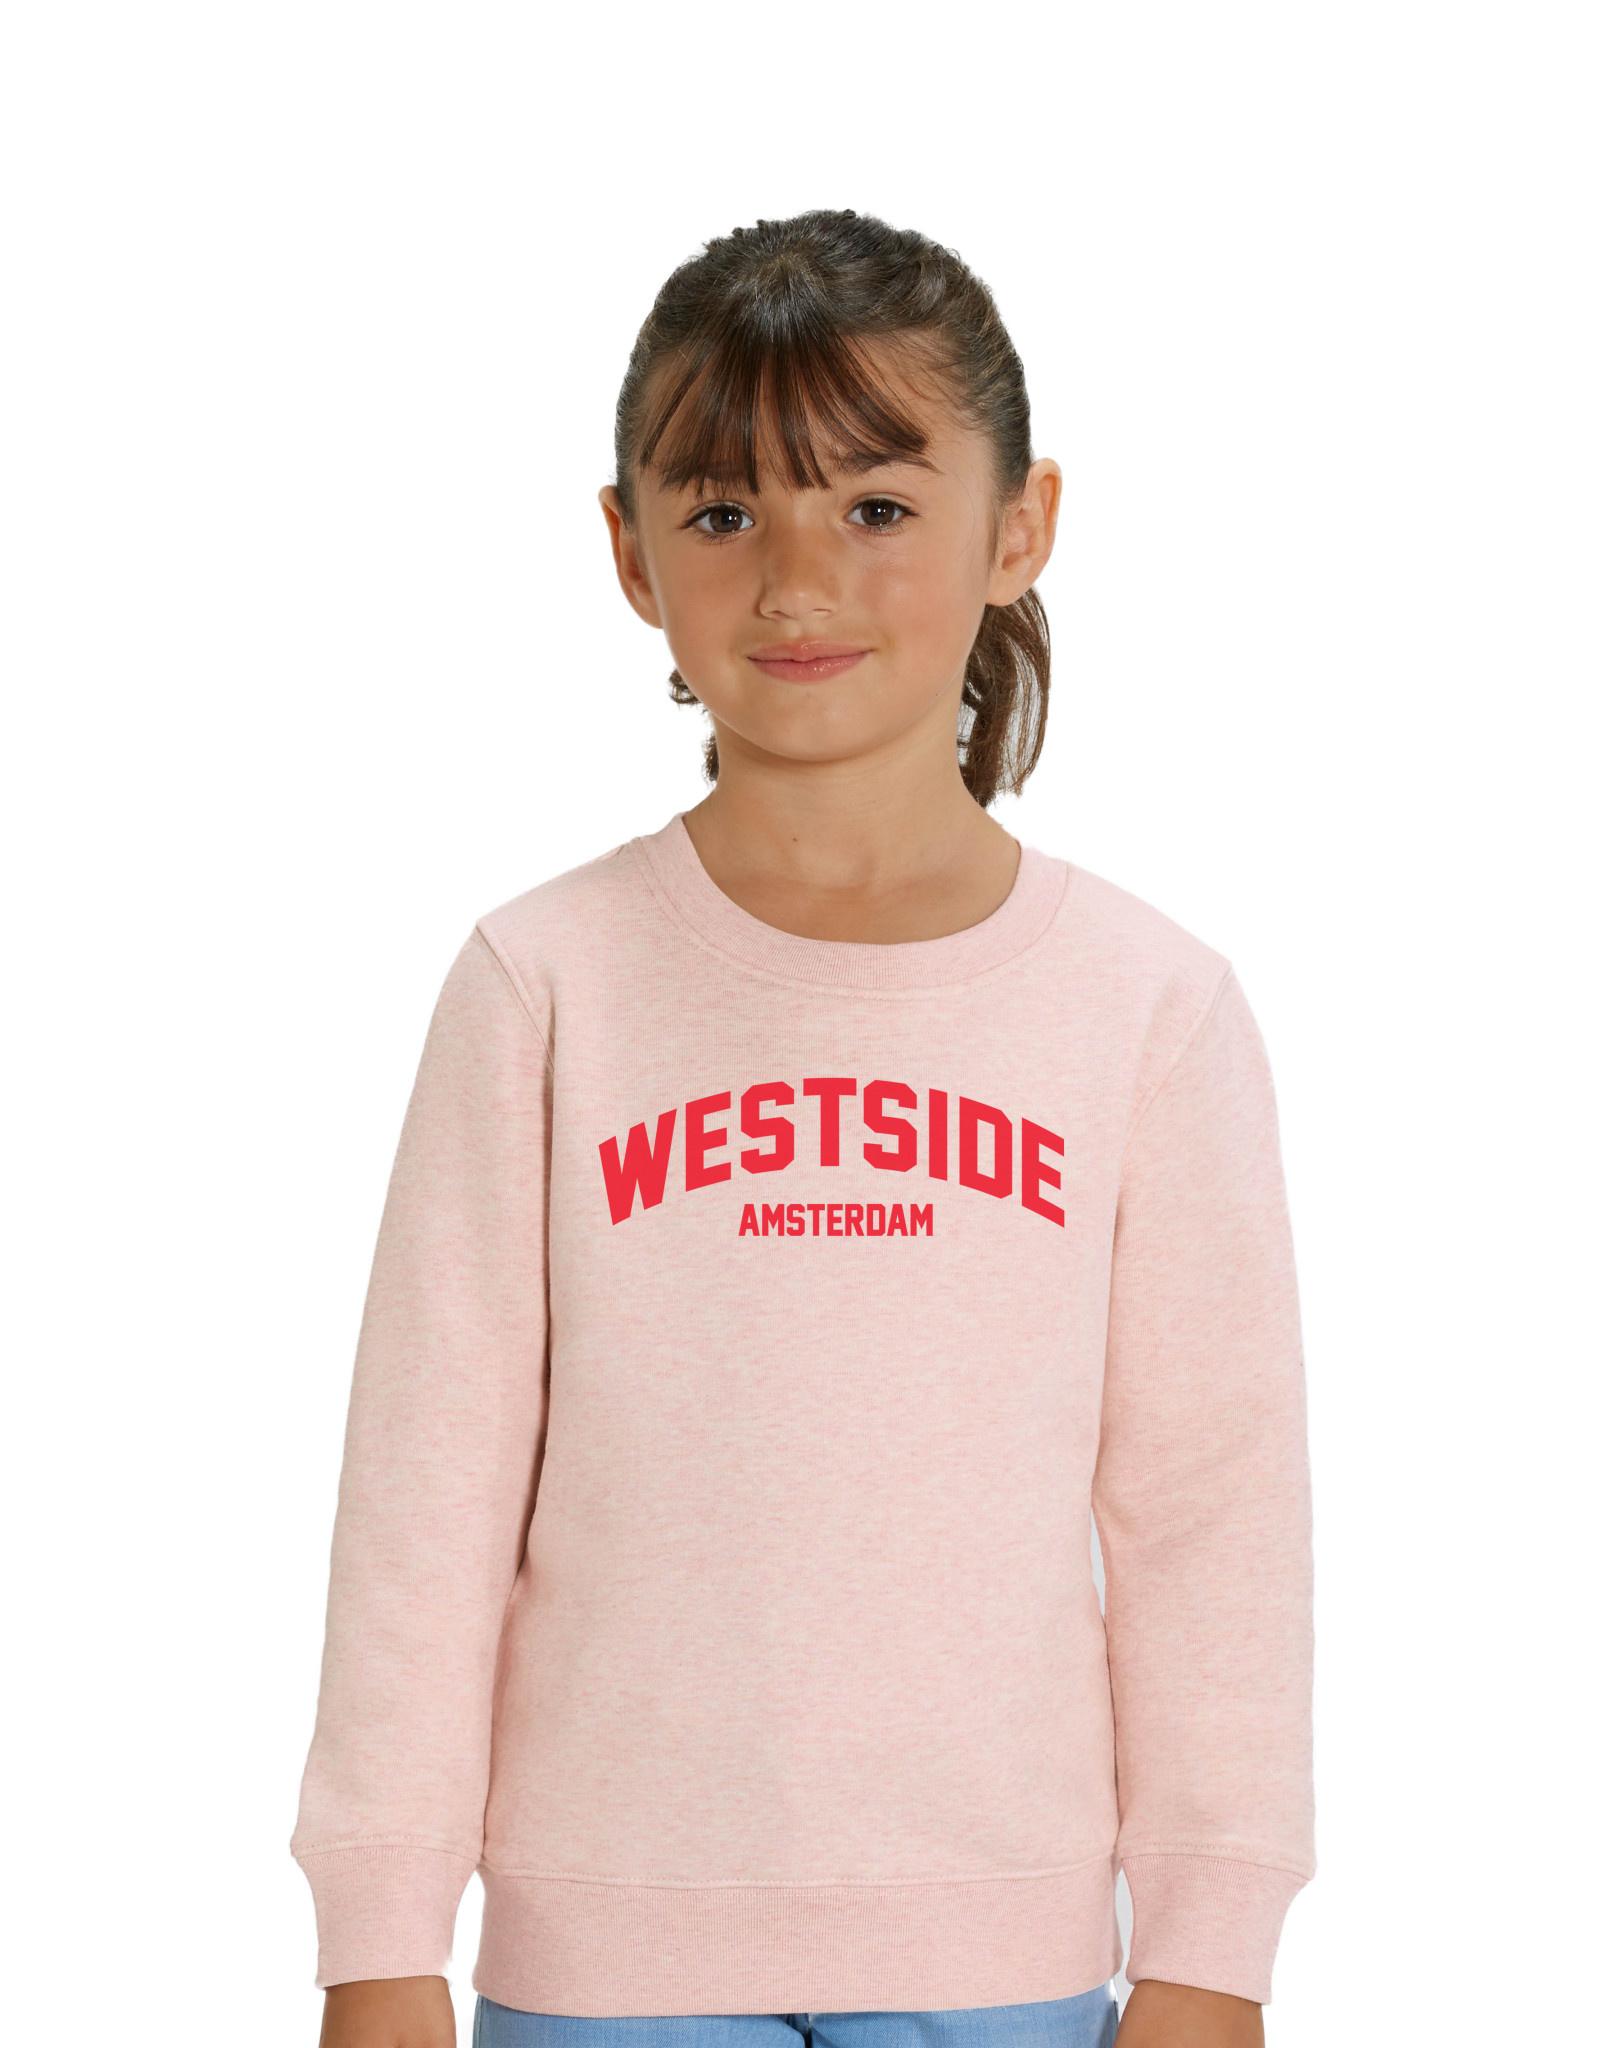 Westside Amsterdam Sweater